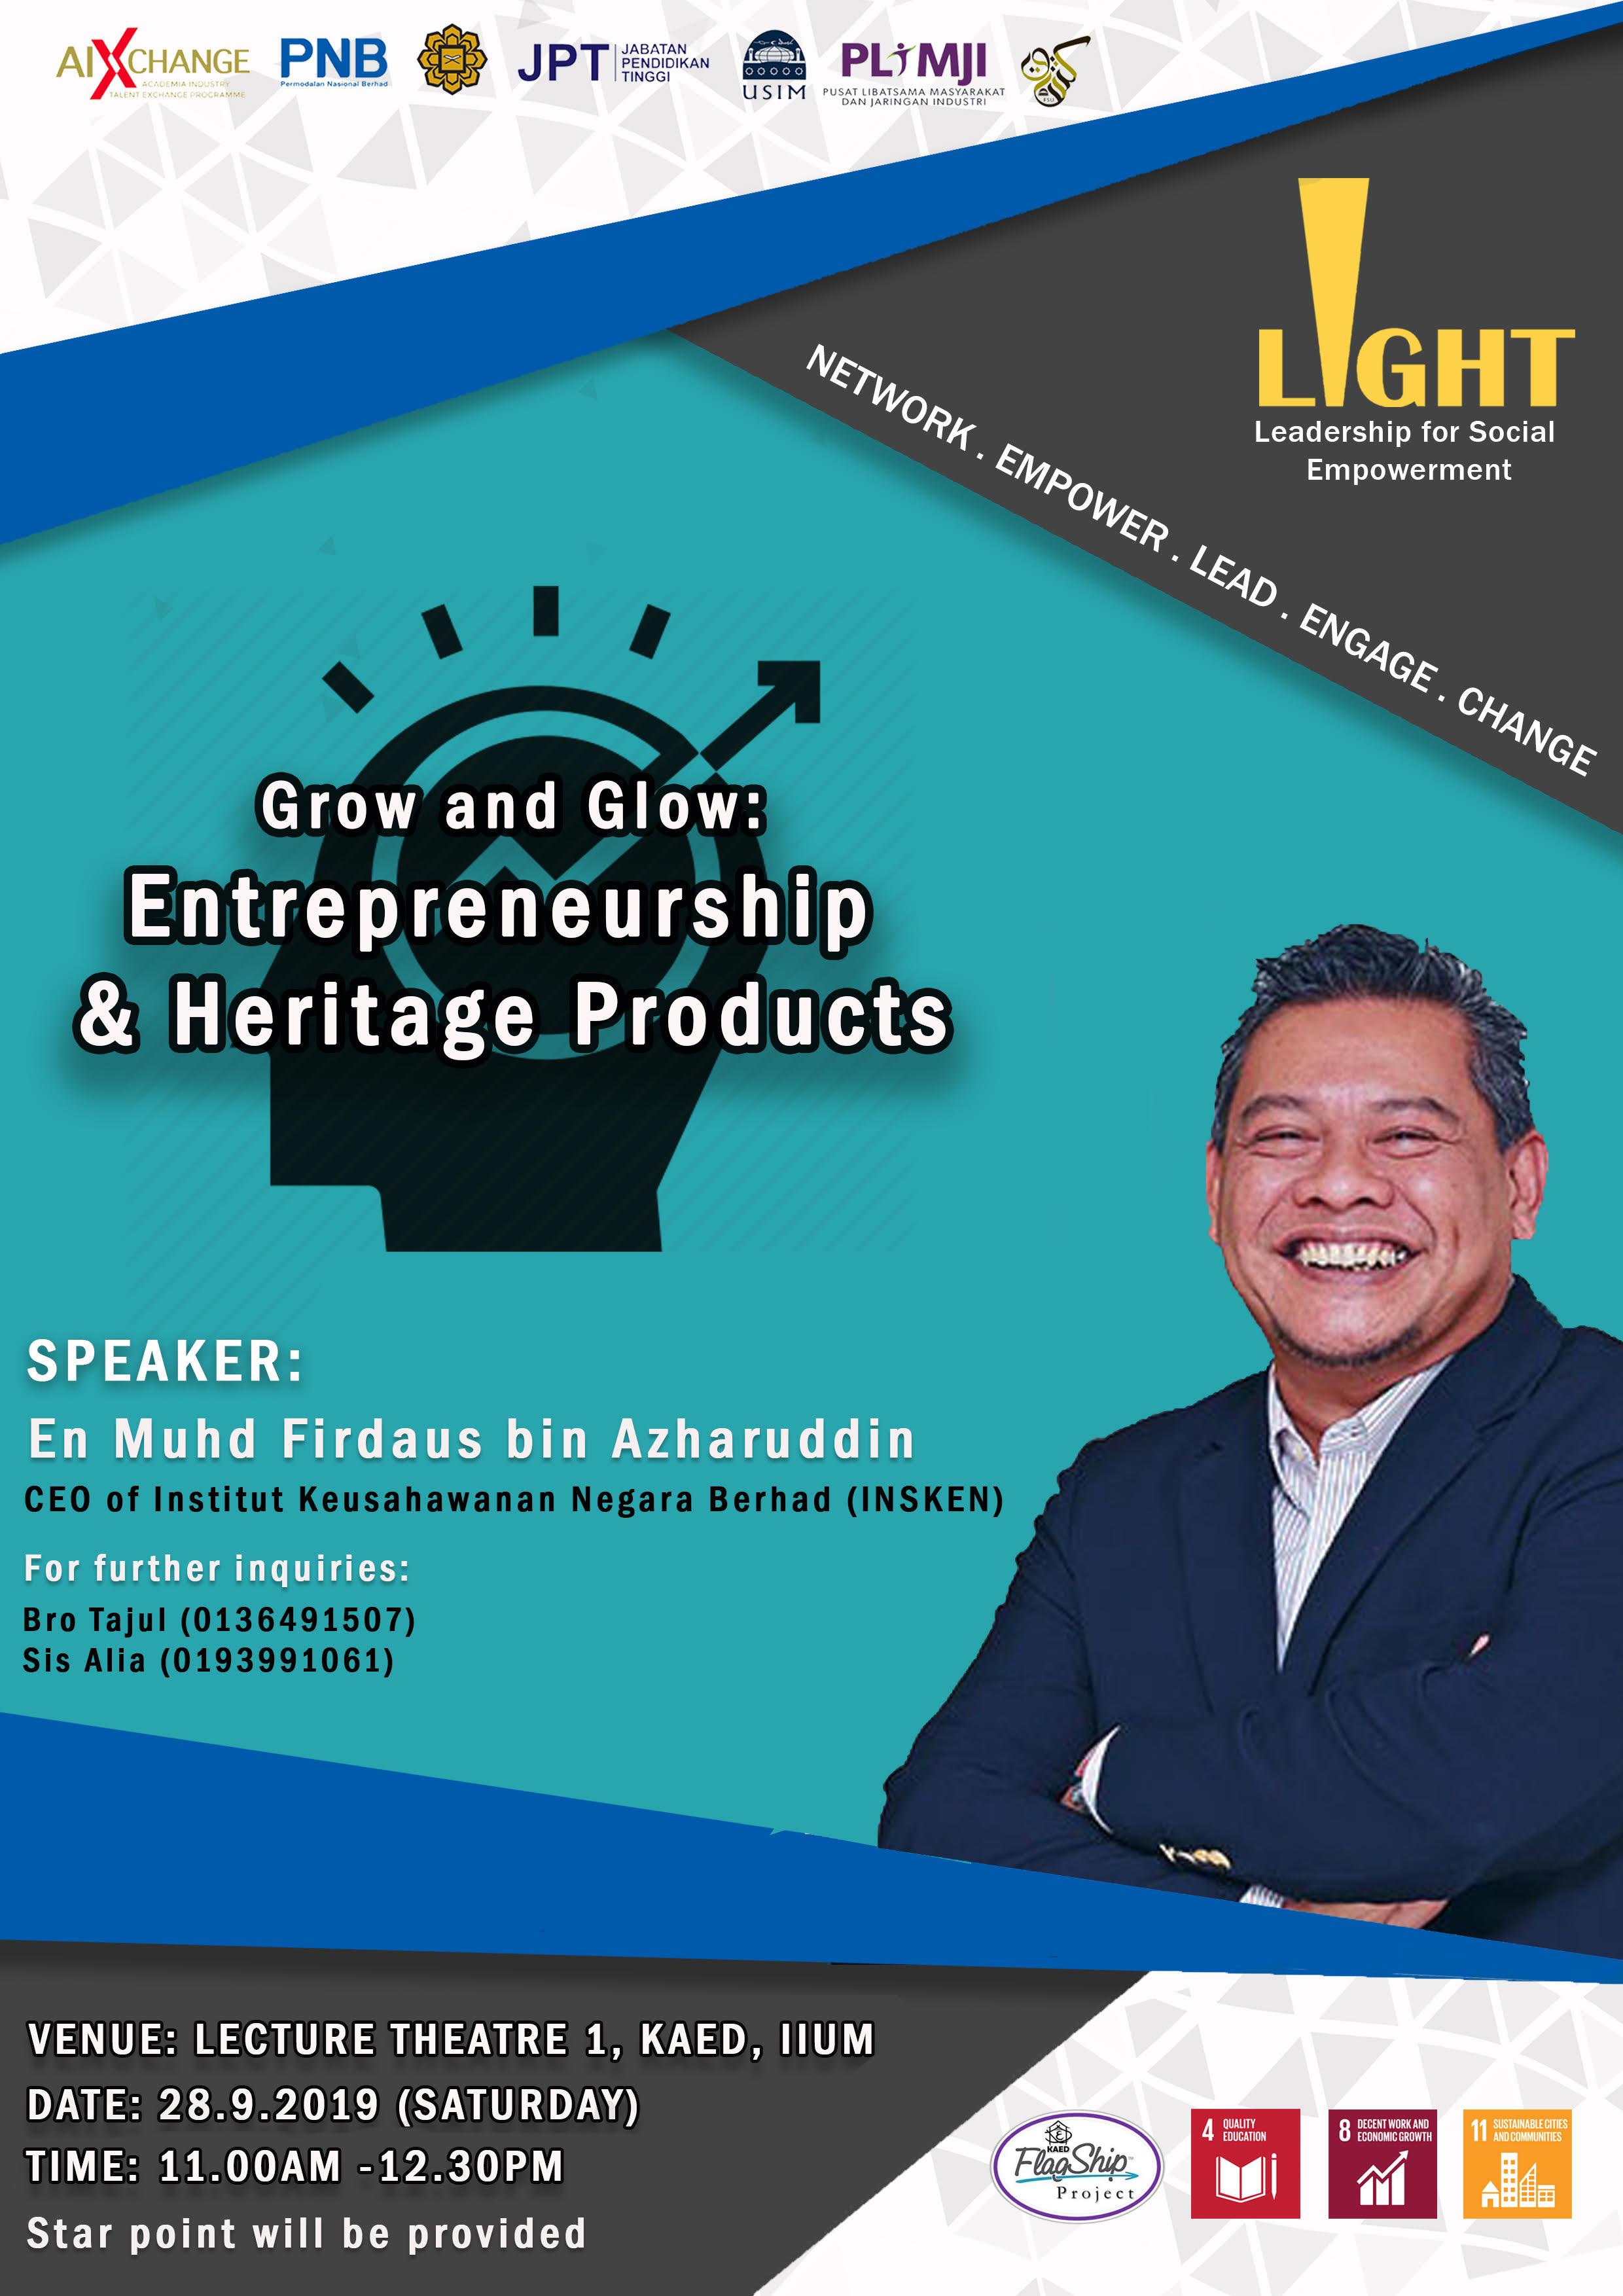 Grow & Glow: Entrepreneurship & Heritage Products